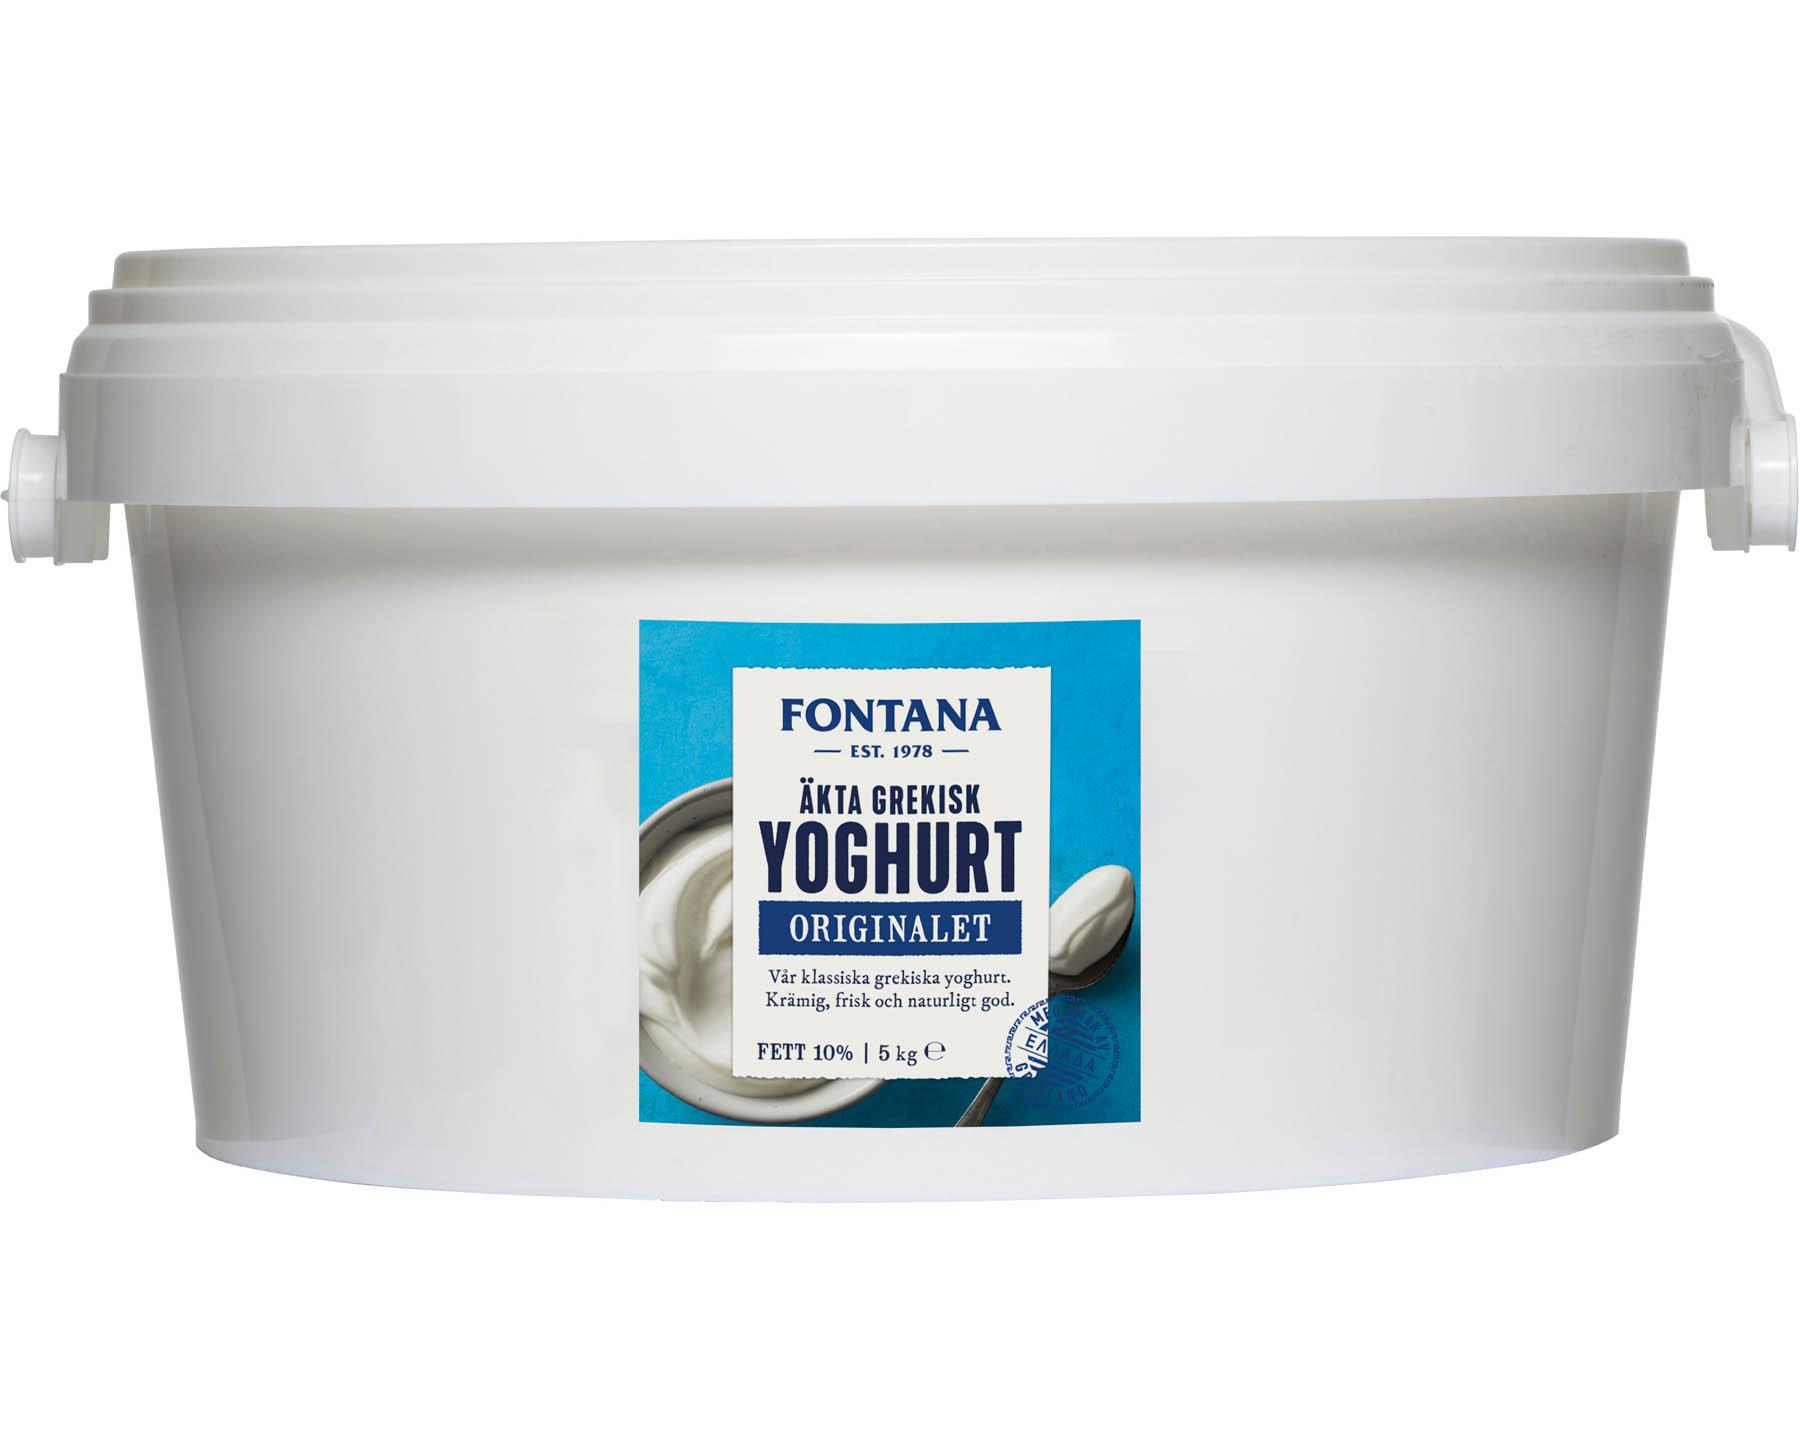 Fontana Äkta Grekisk Yoghurt 10%